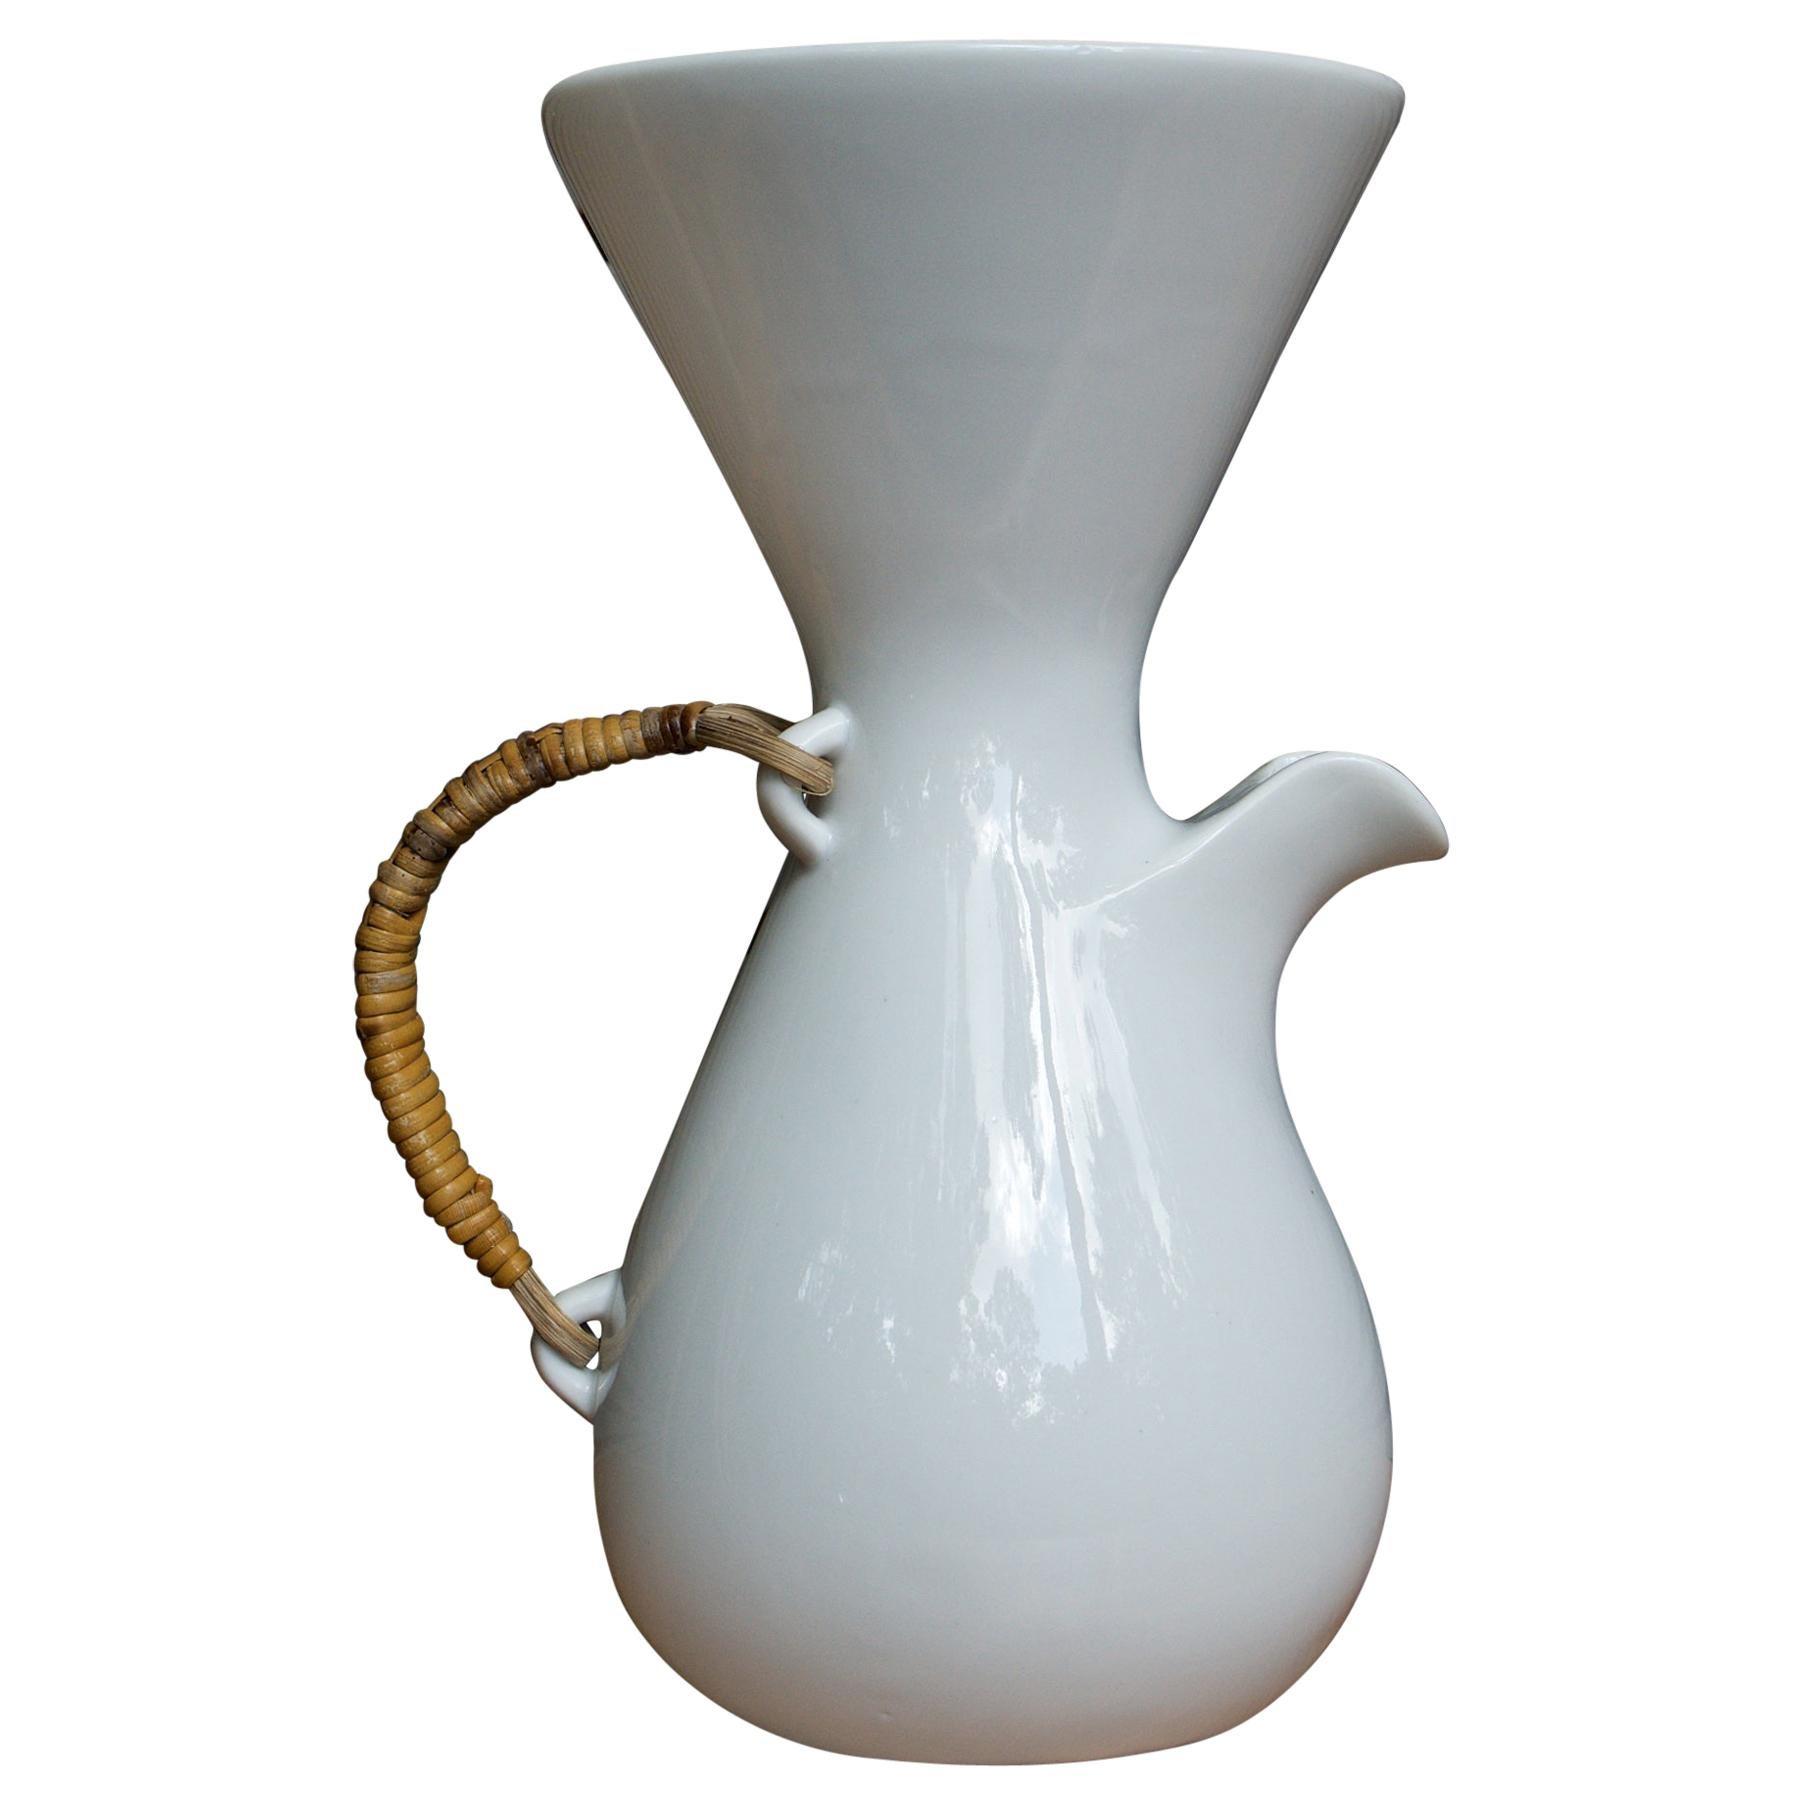 1950s Kenji Fujita for Tackett Associates Cane Handled Teapot Water Pitcher Vase